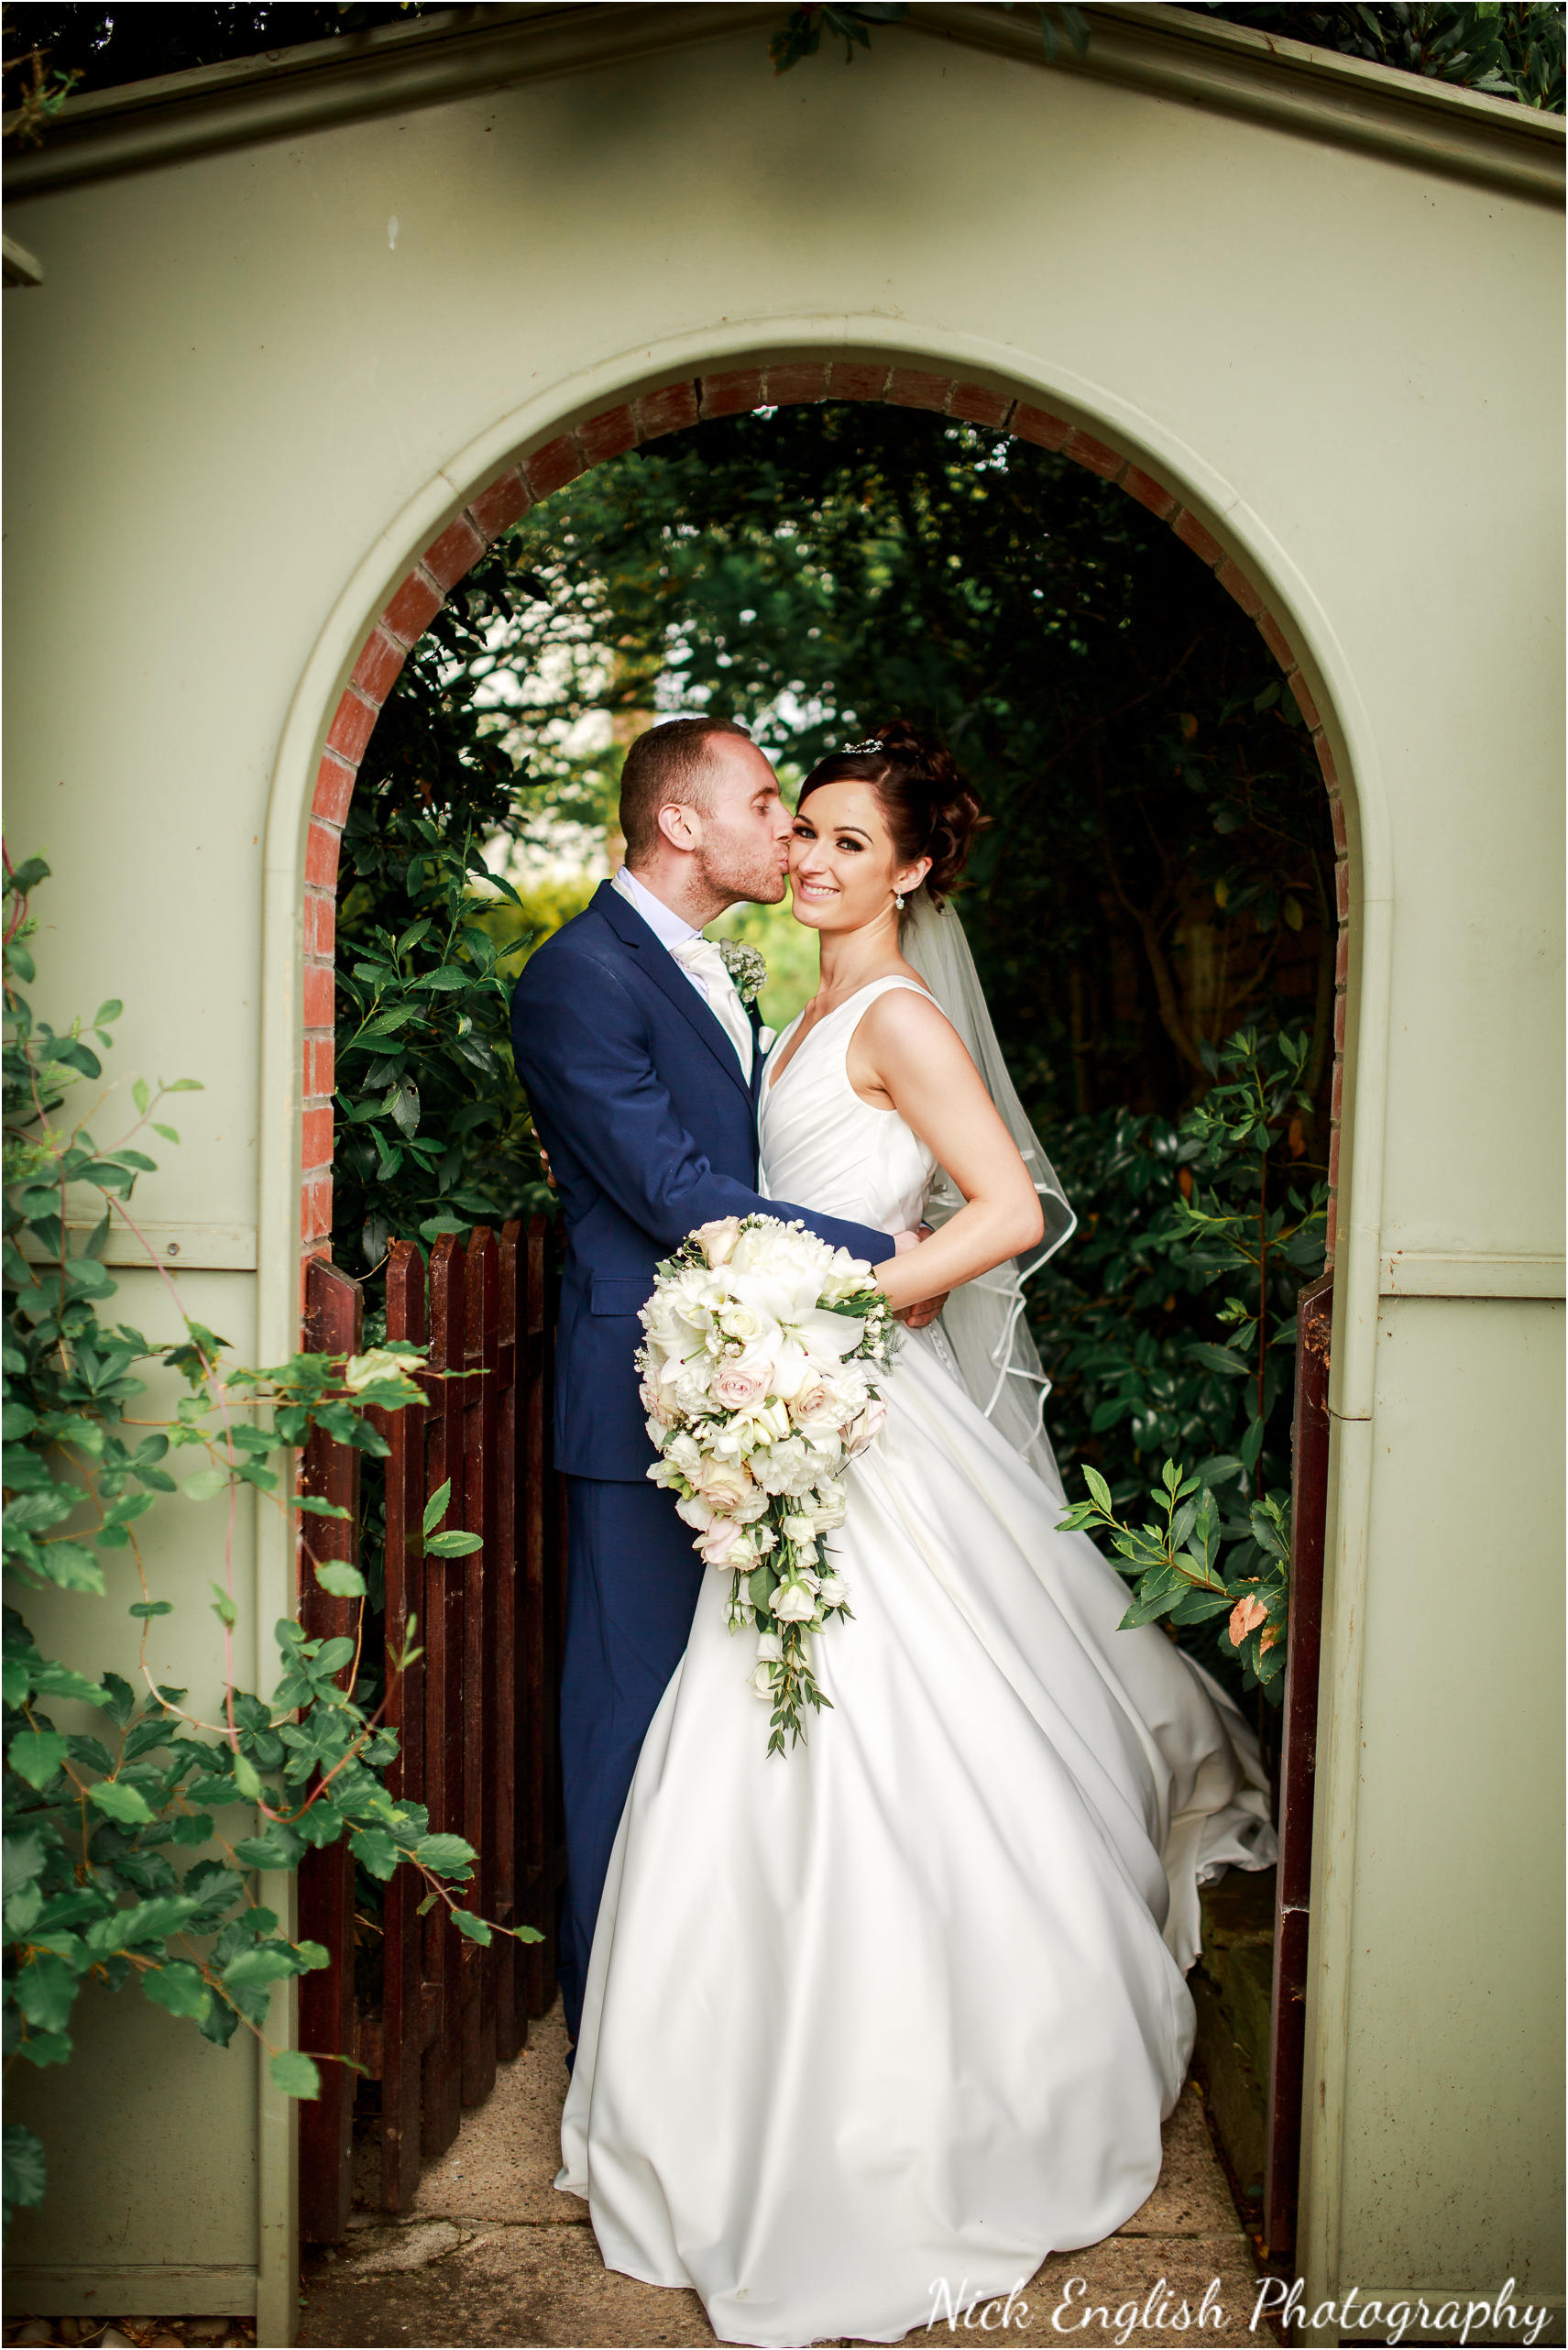 Emily David Wedding Photographs at Barton Grange Preston by Nick English Photography 147jpg.jpeg